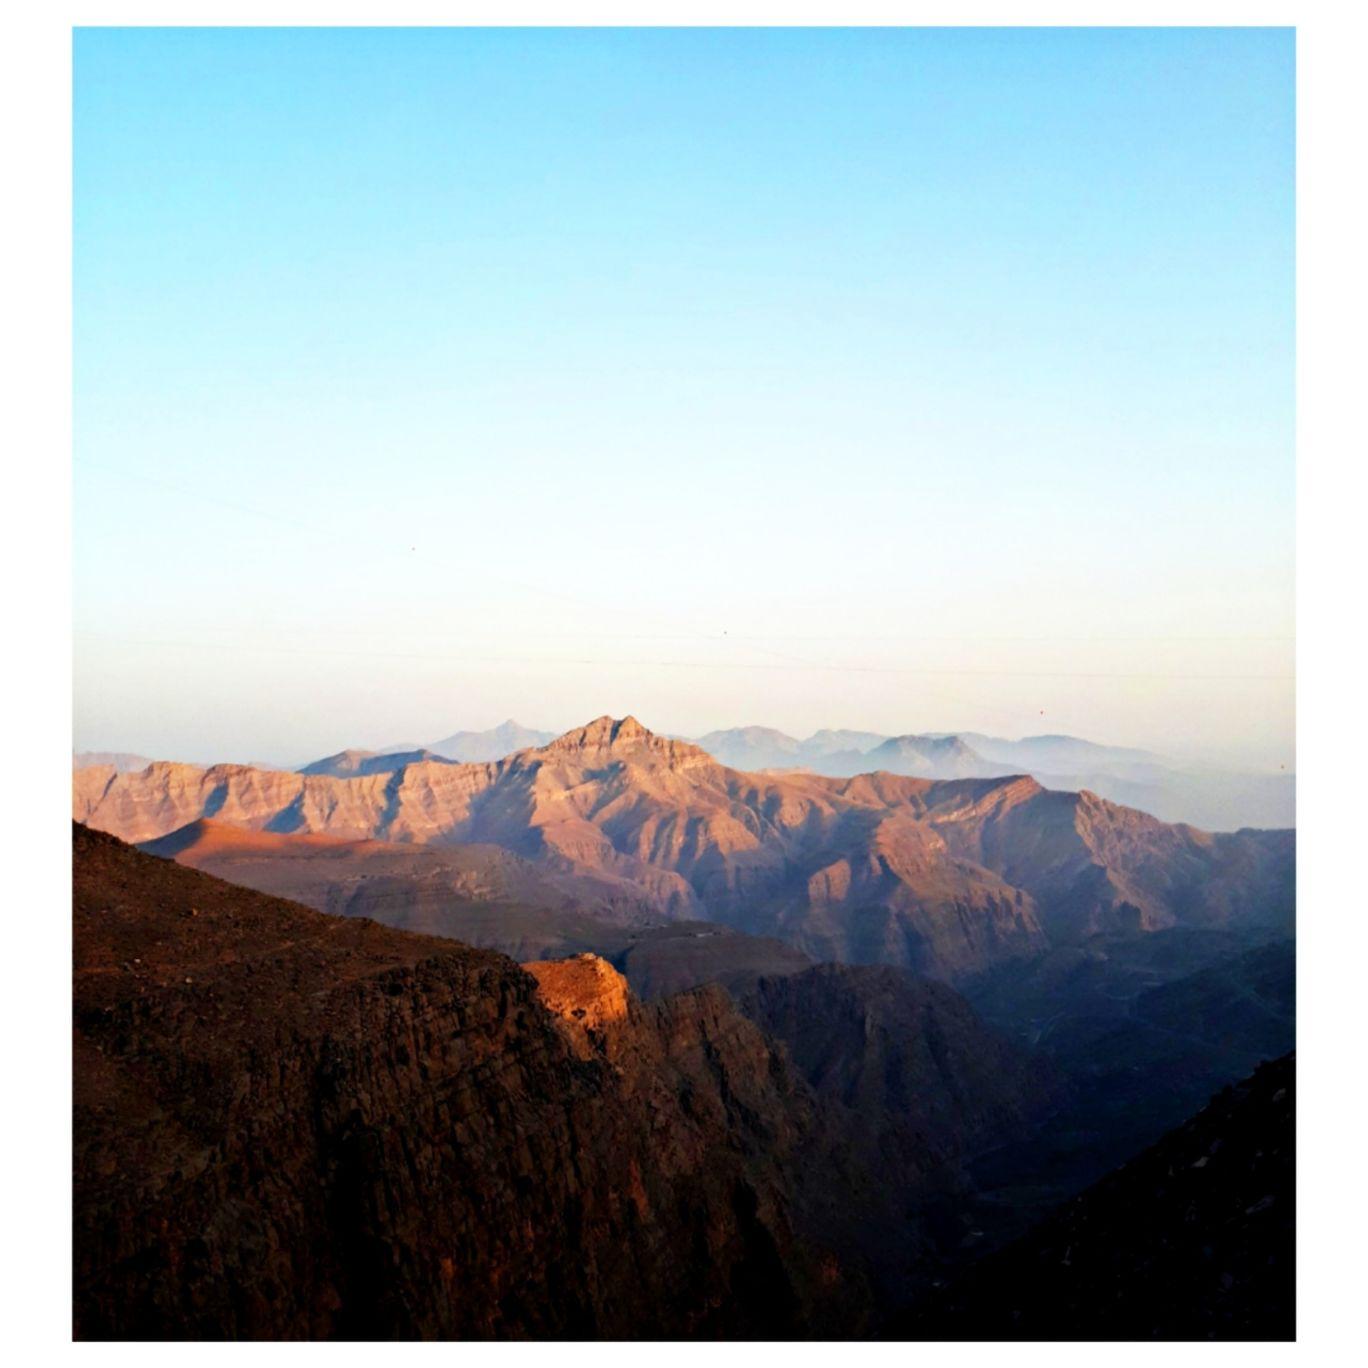 Photo of Jebel Jais - Ras al Khaimah - United Arab Emirates By Natasha Shetty